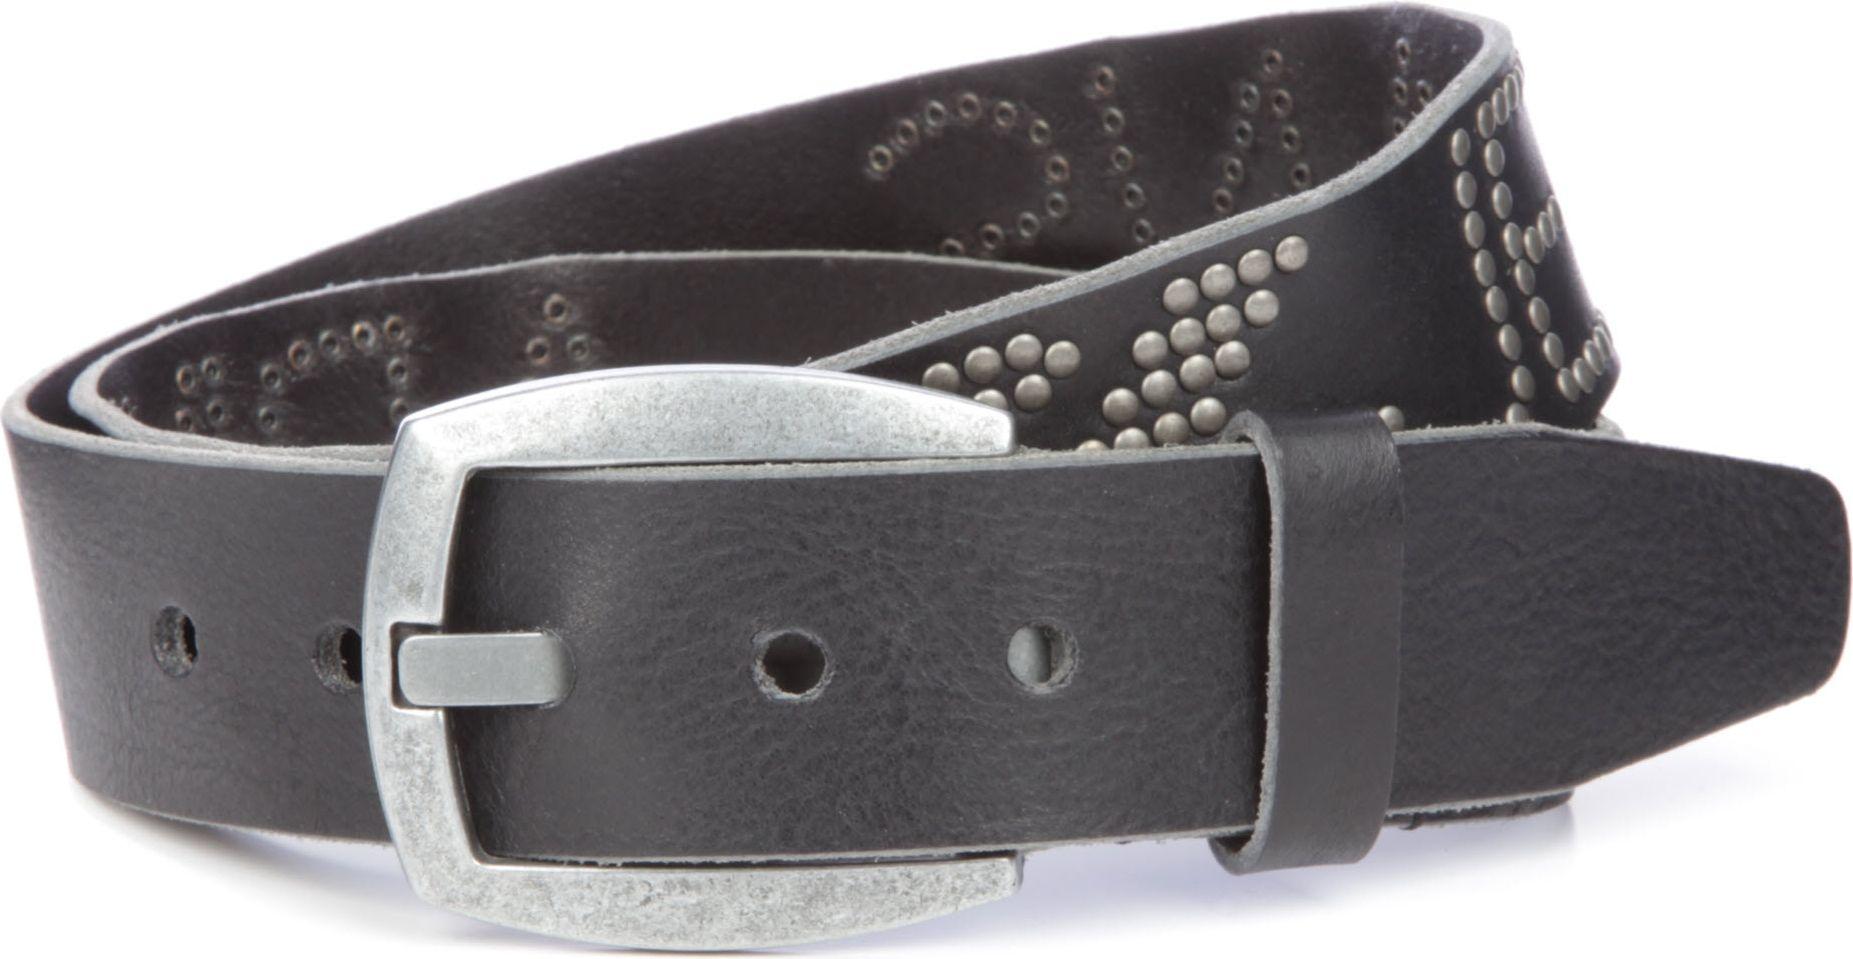 Lyst - Armani Jeans Studded Logo Belt in Black for Men